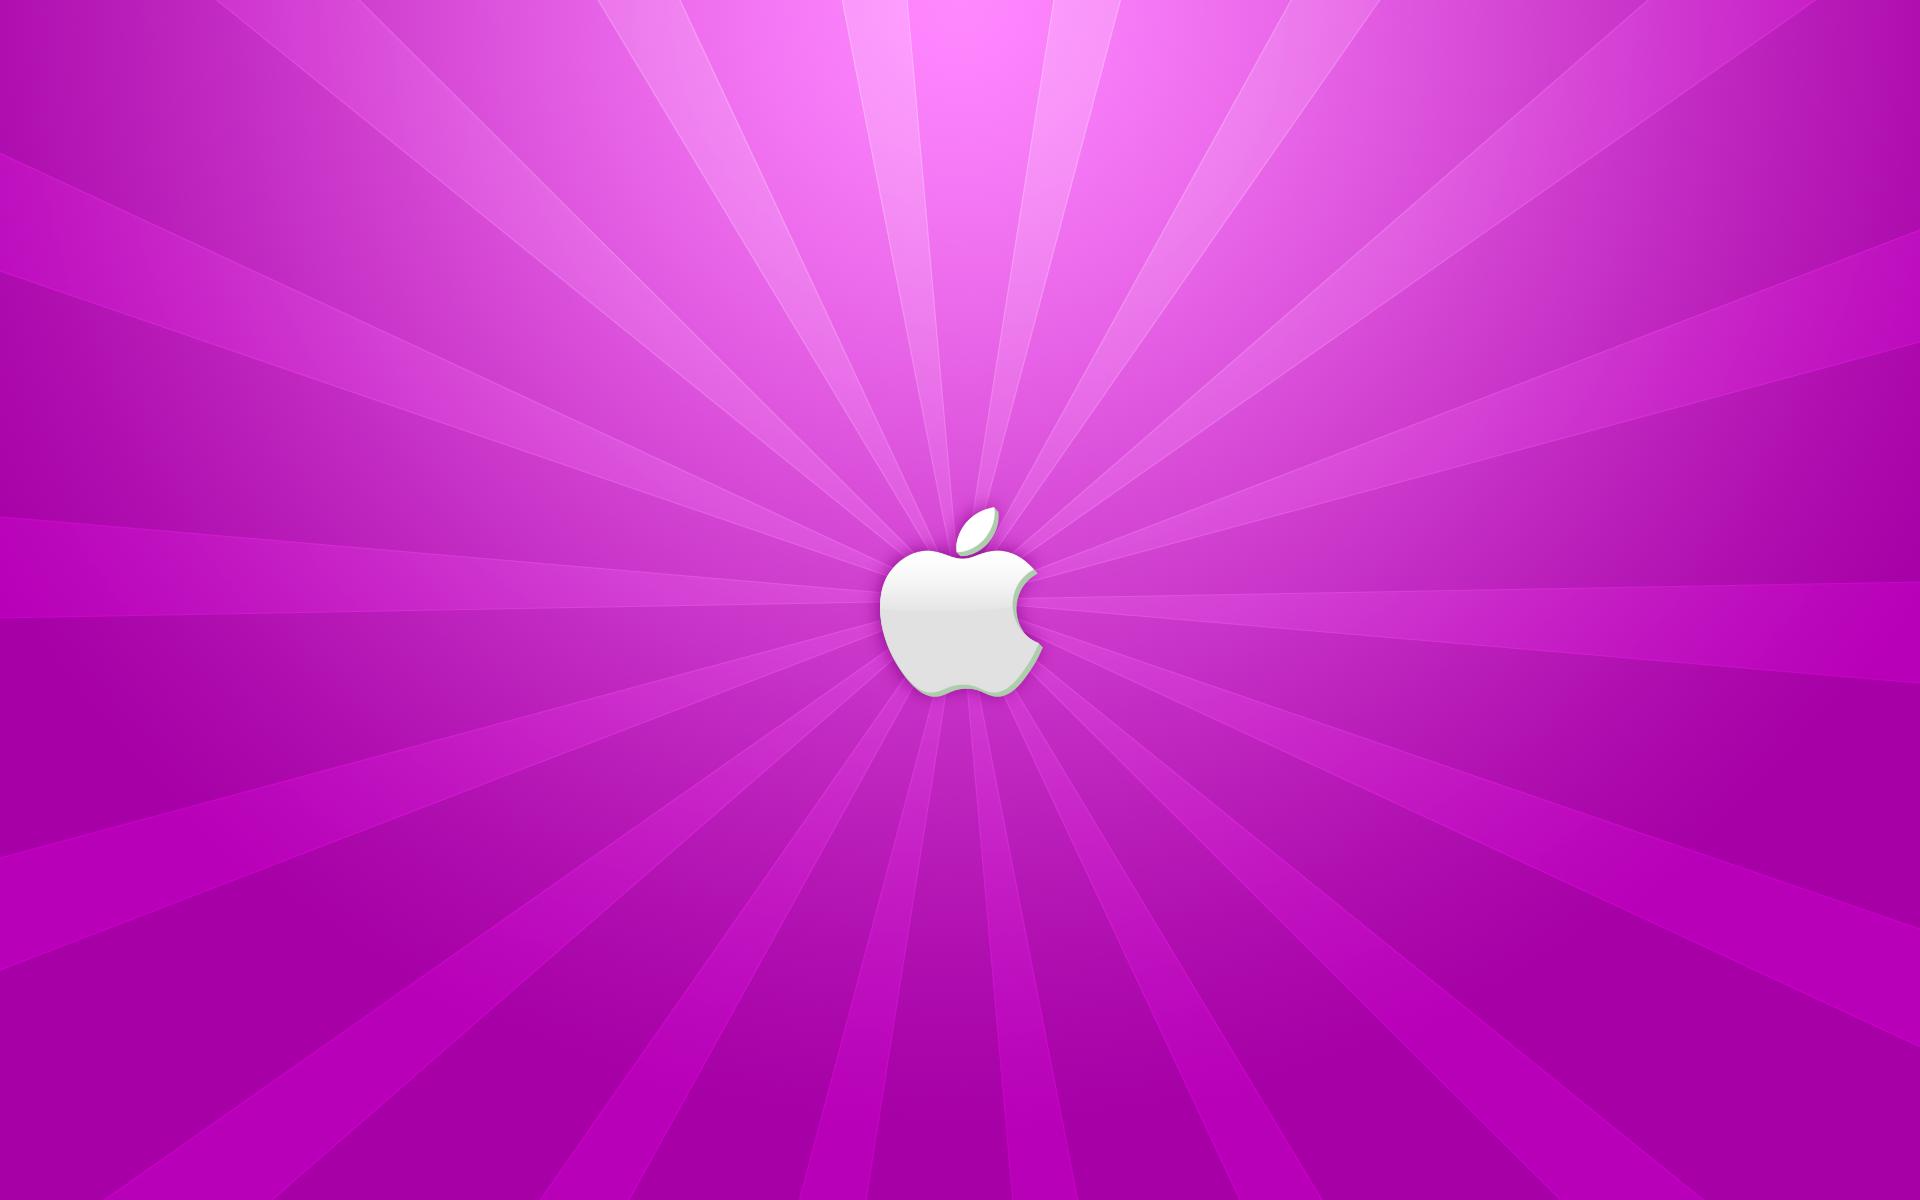 A Purple Apple